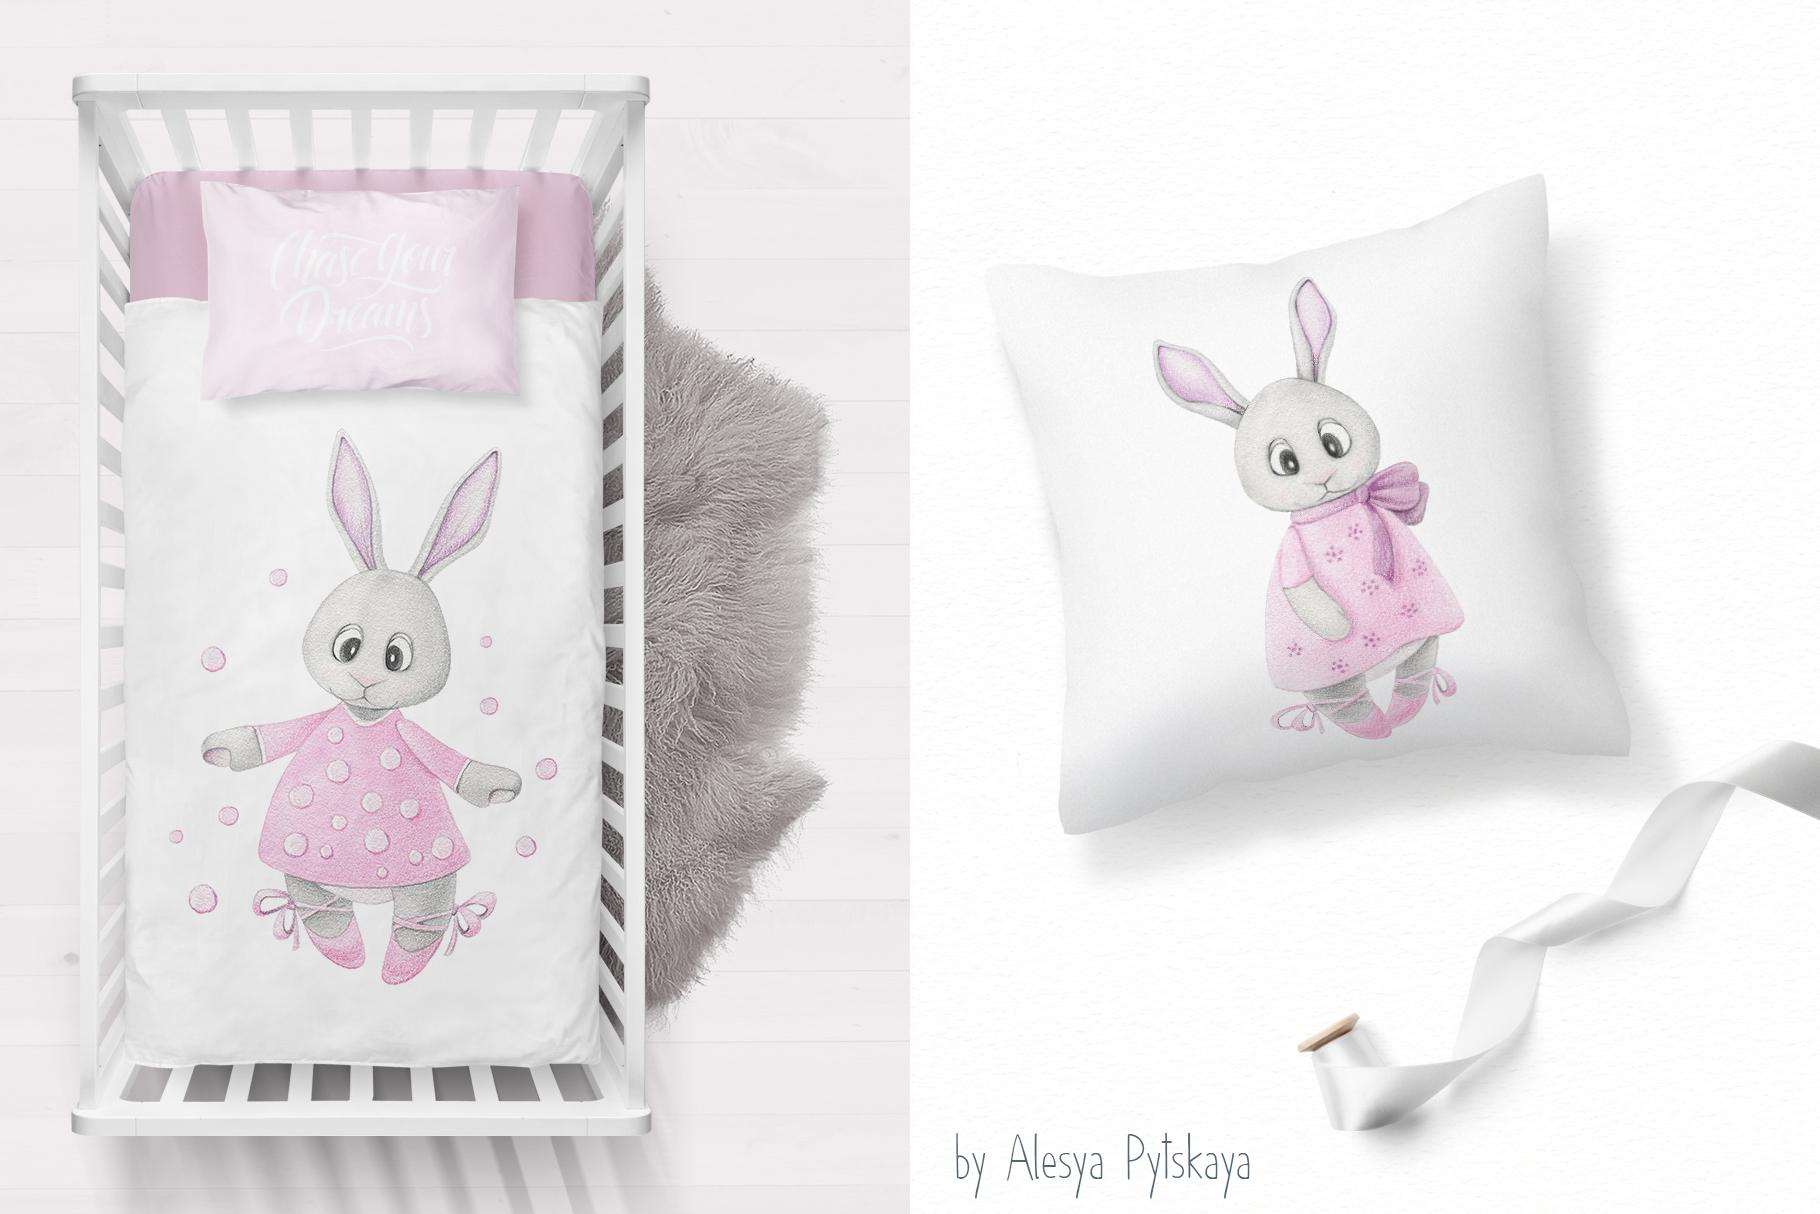 Cute bunny ballet dancer example image 3